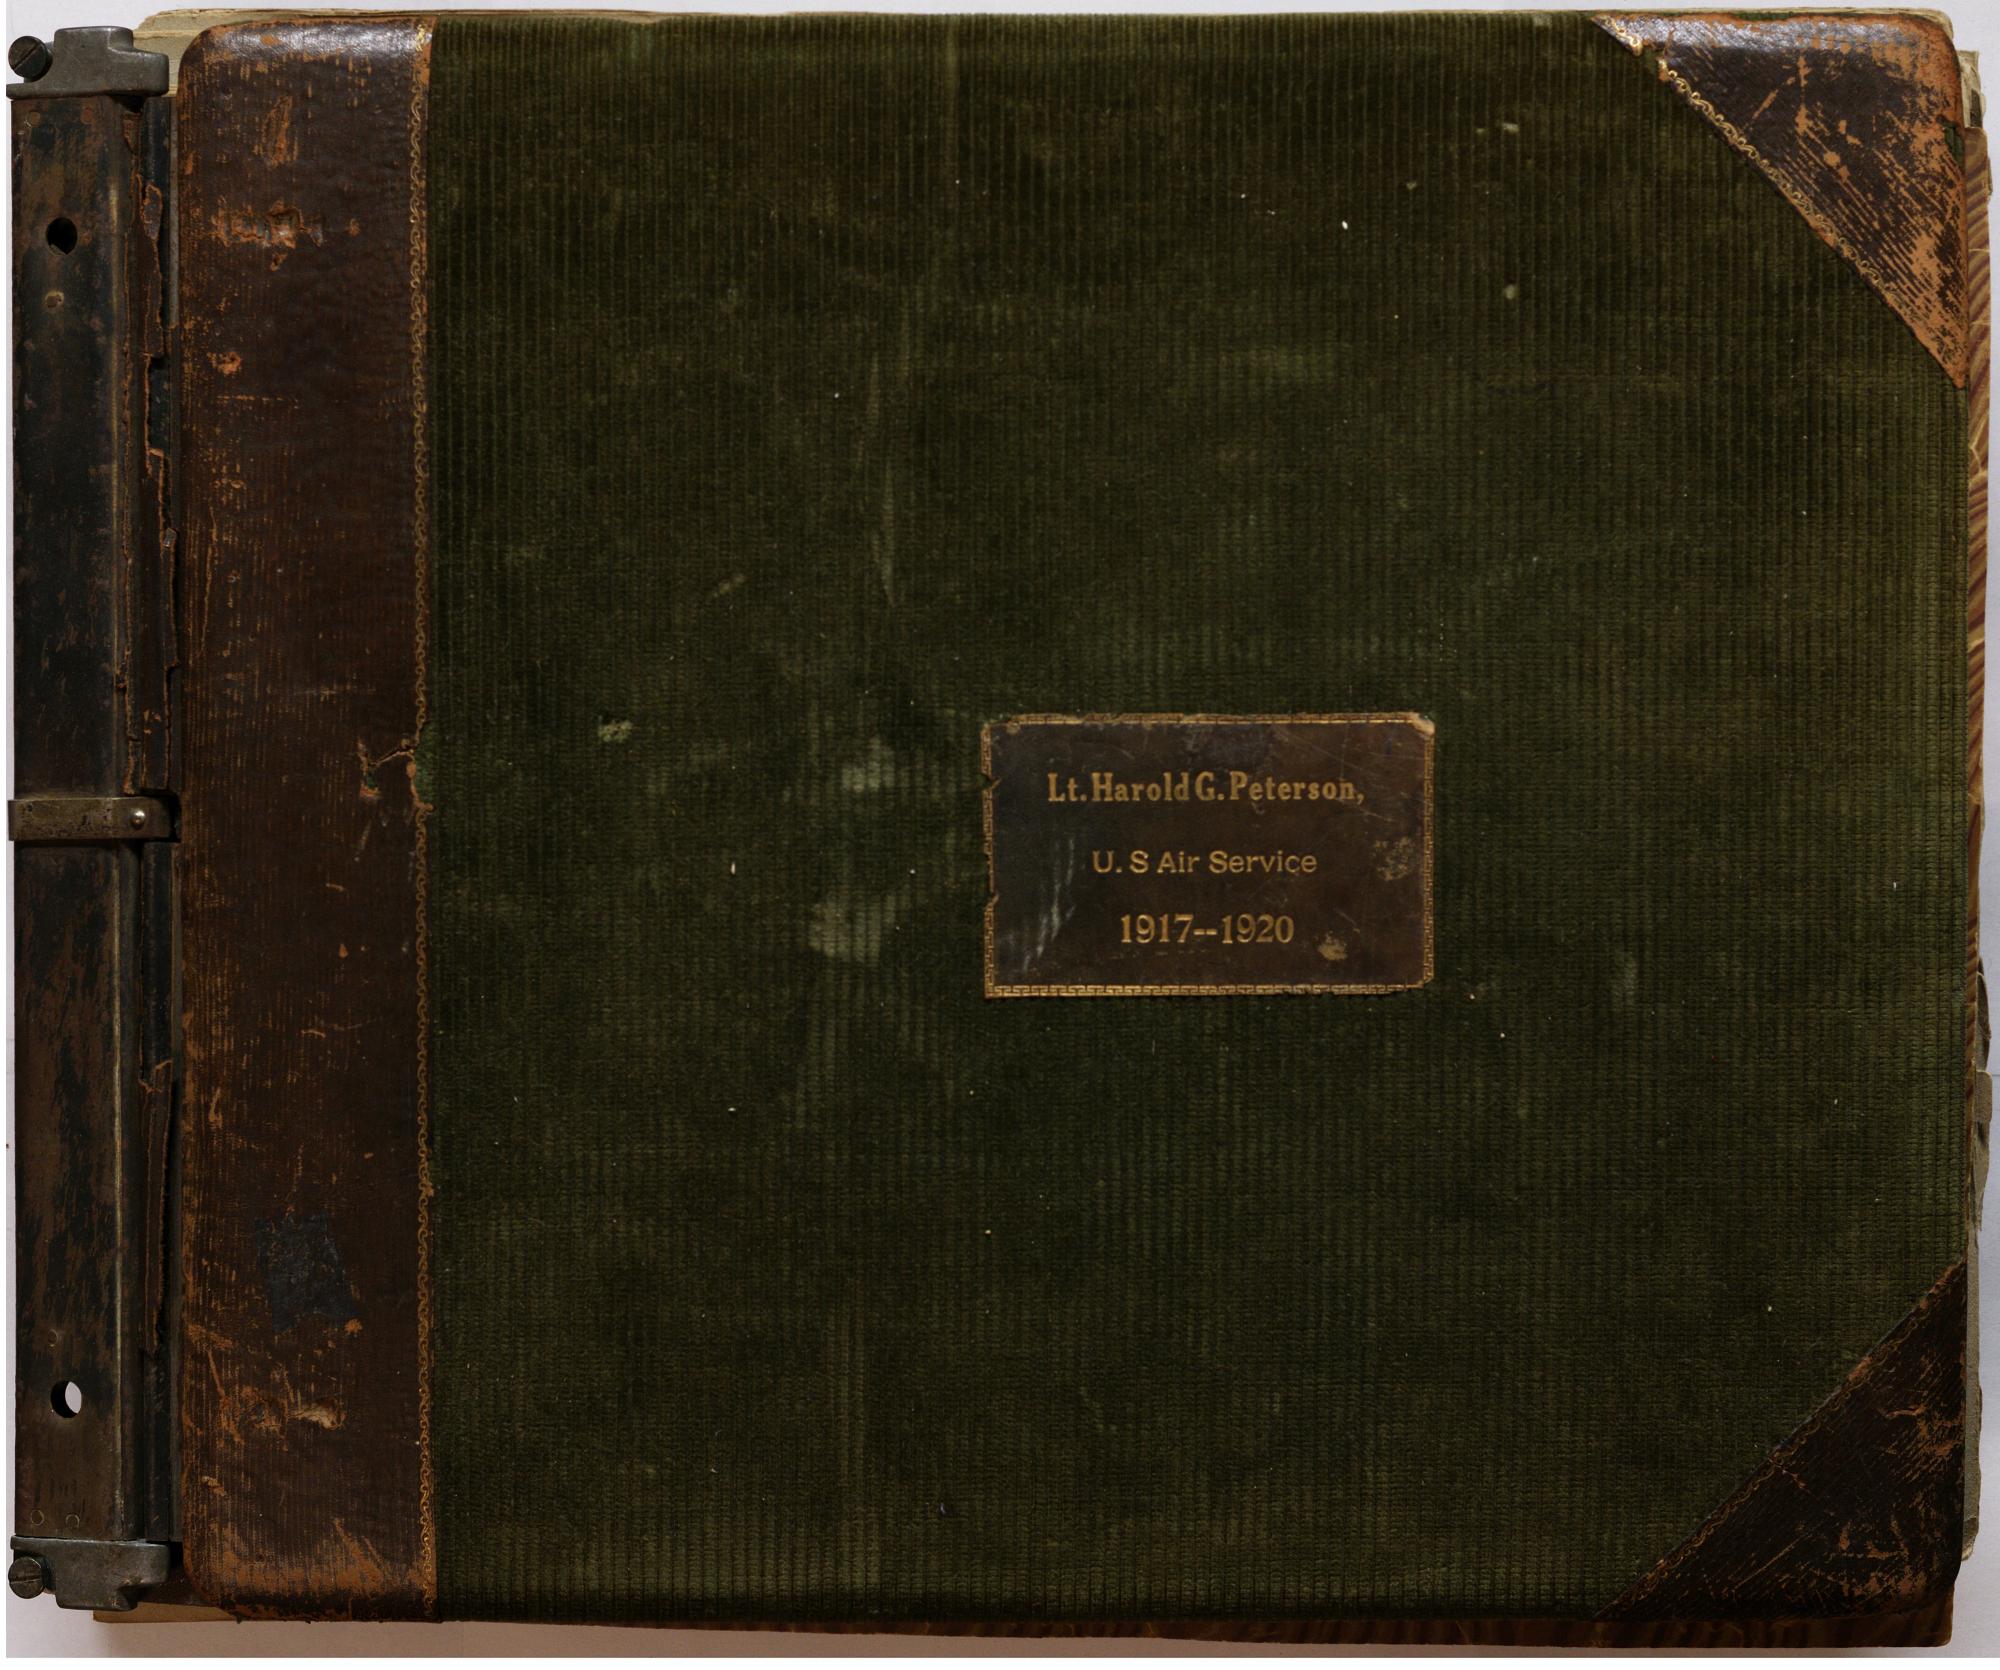 Lieutenant Harold G. Peterson Scrapbook